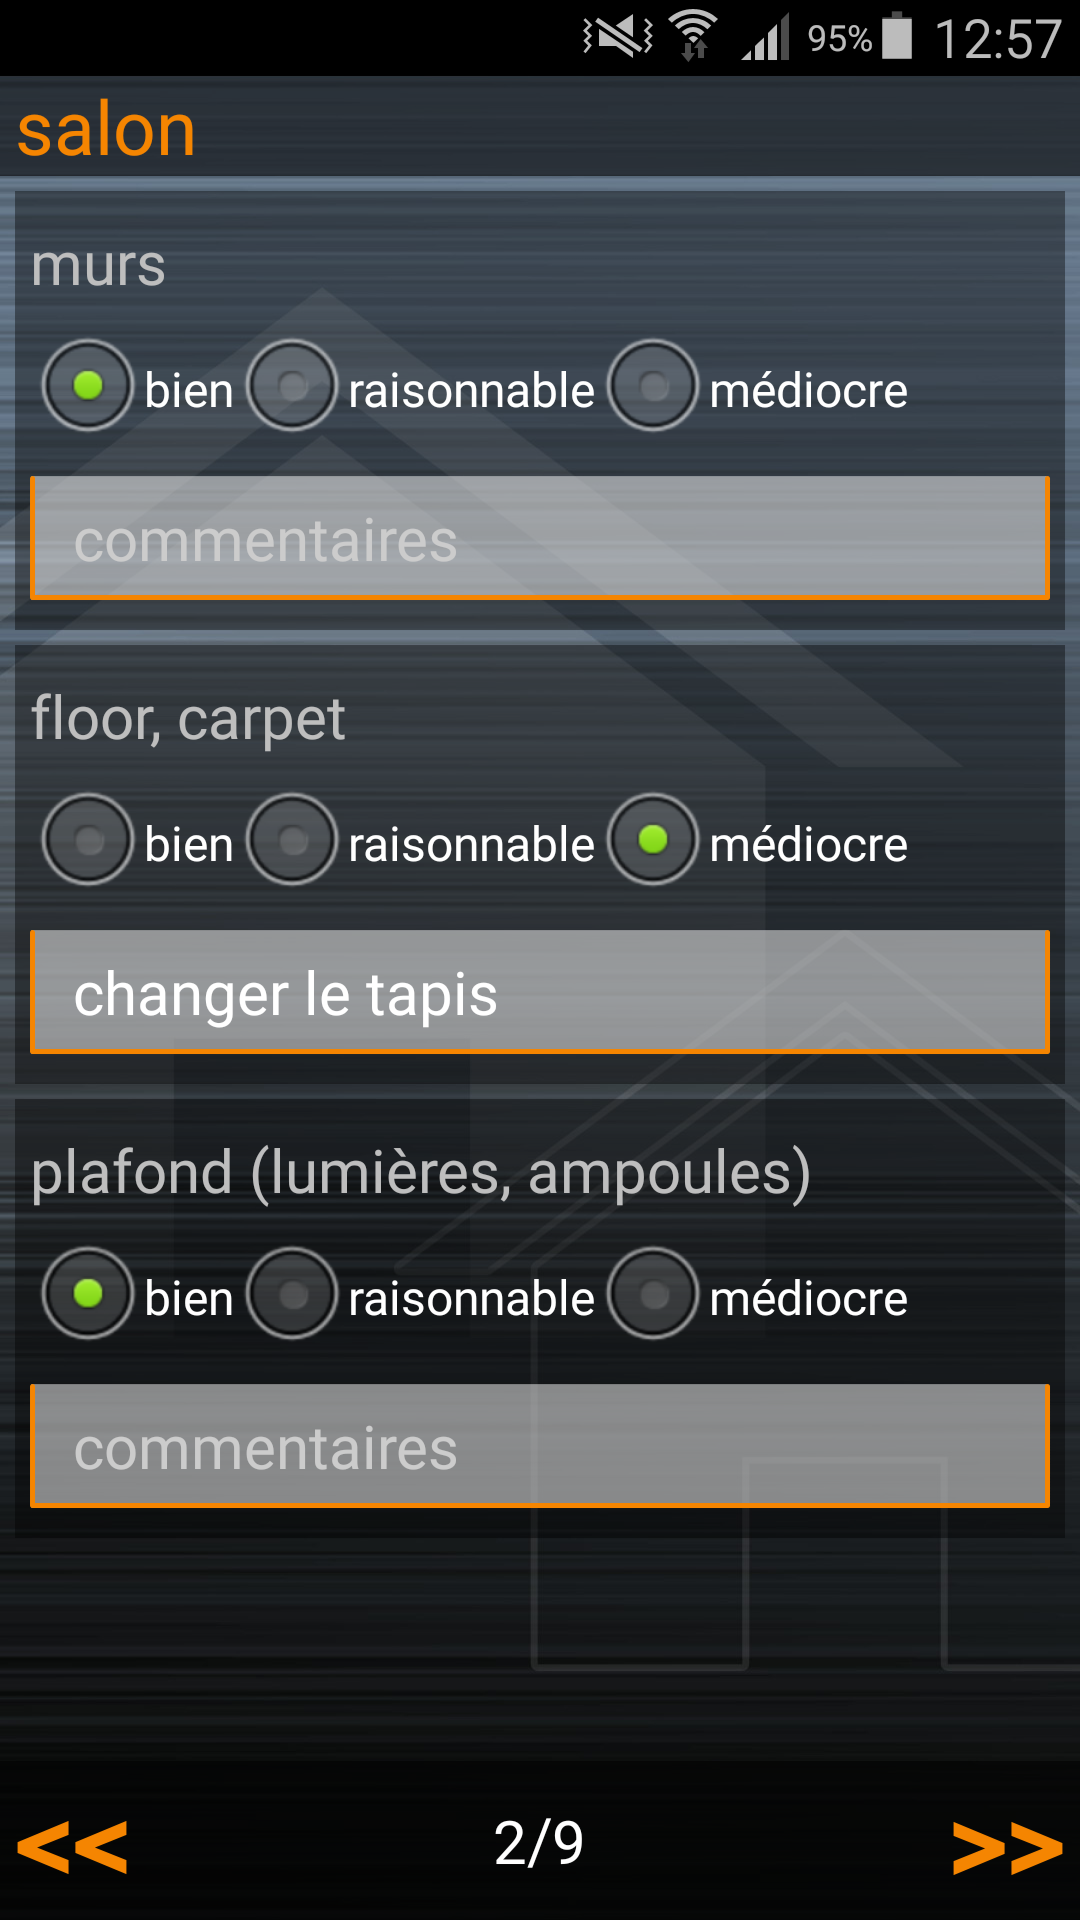 ginstr_app_flatHandoverChecklist_FR_4